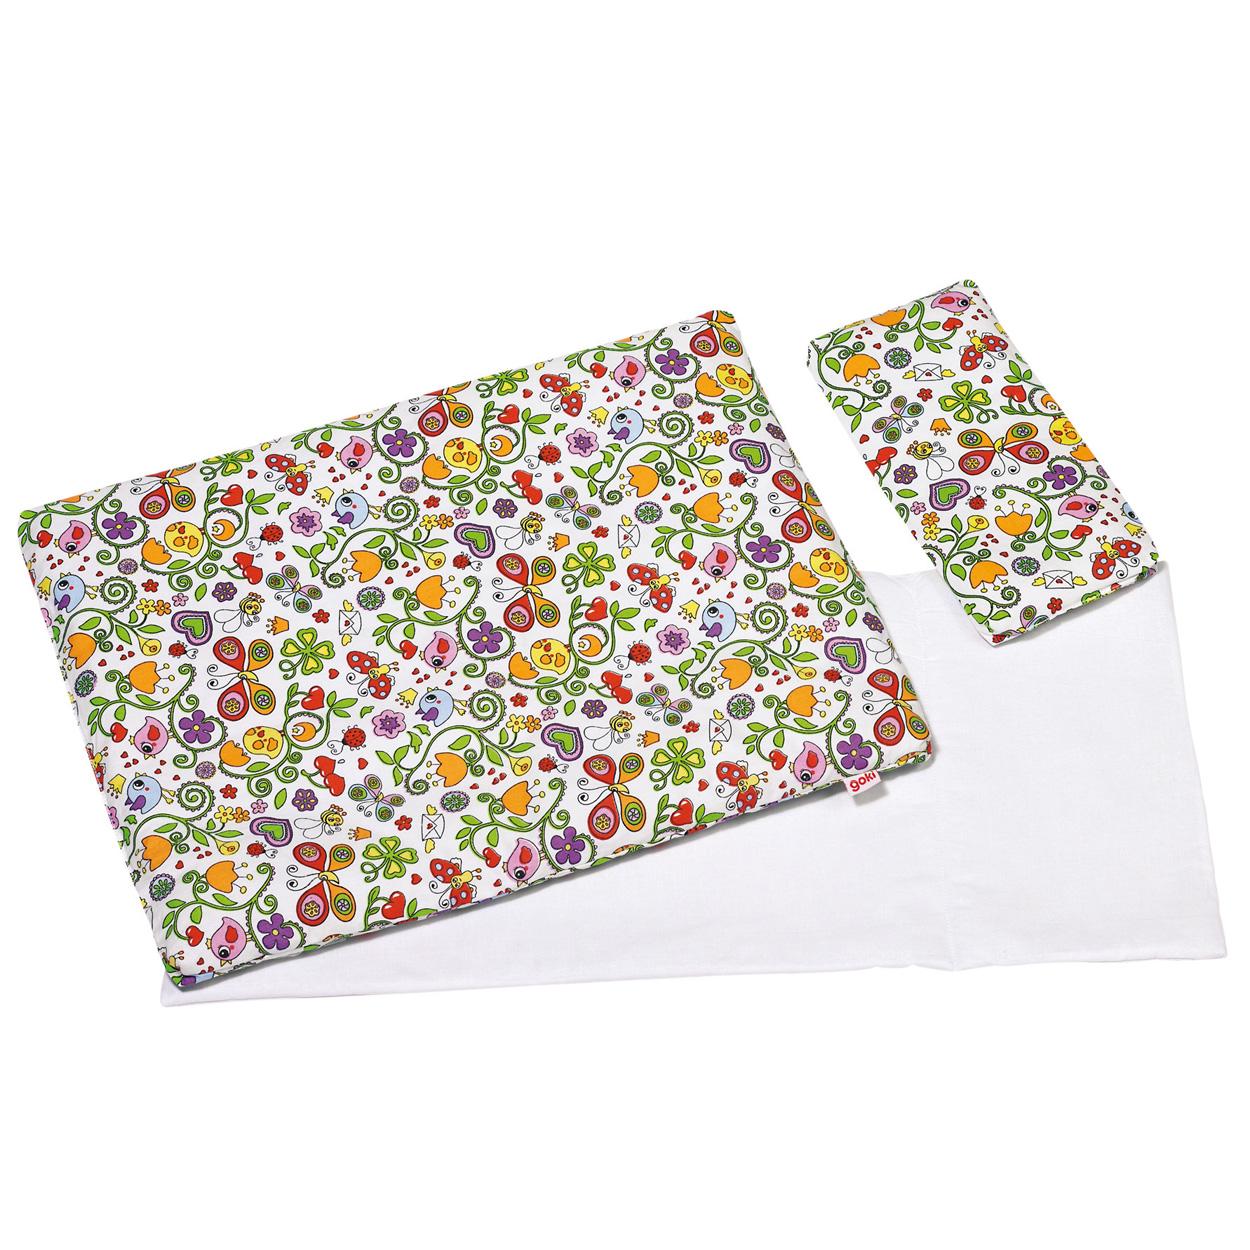 3fa668256e1 Poppen Dekbed en Kussen online kopen | Lobbes Speelgoed